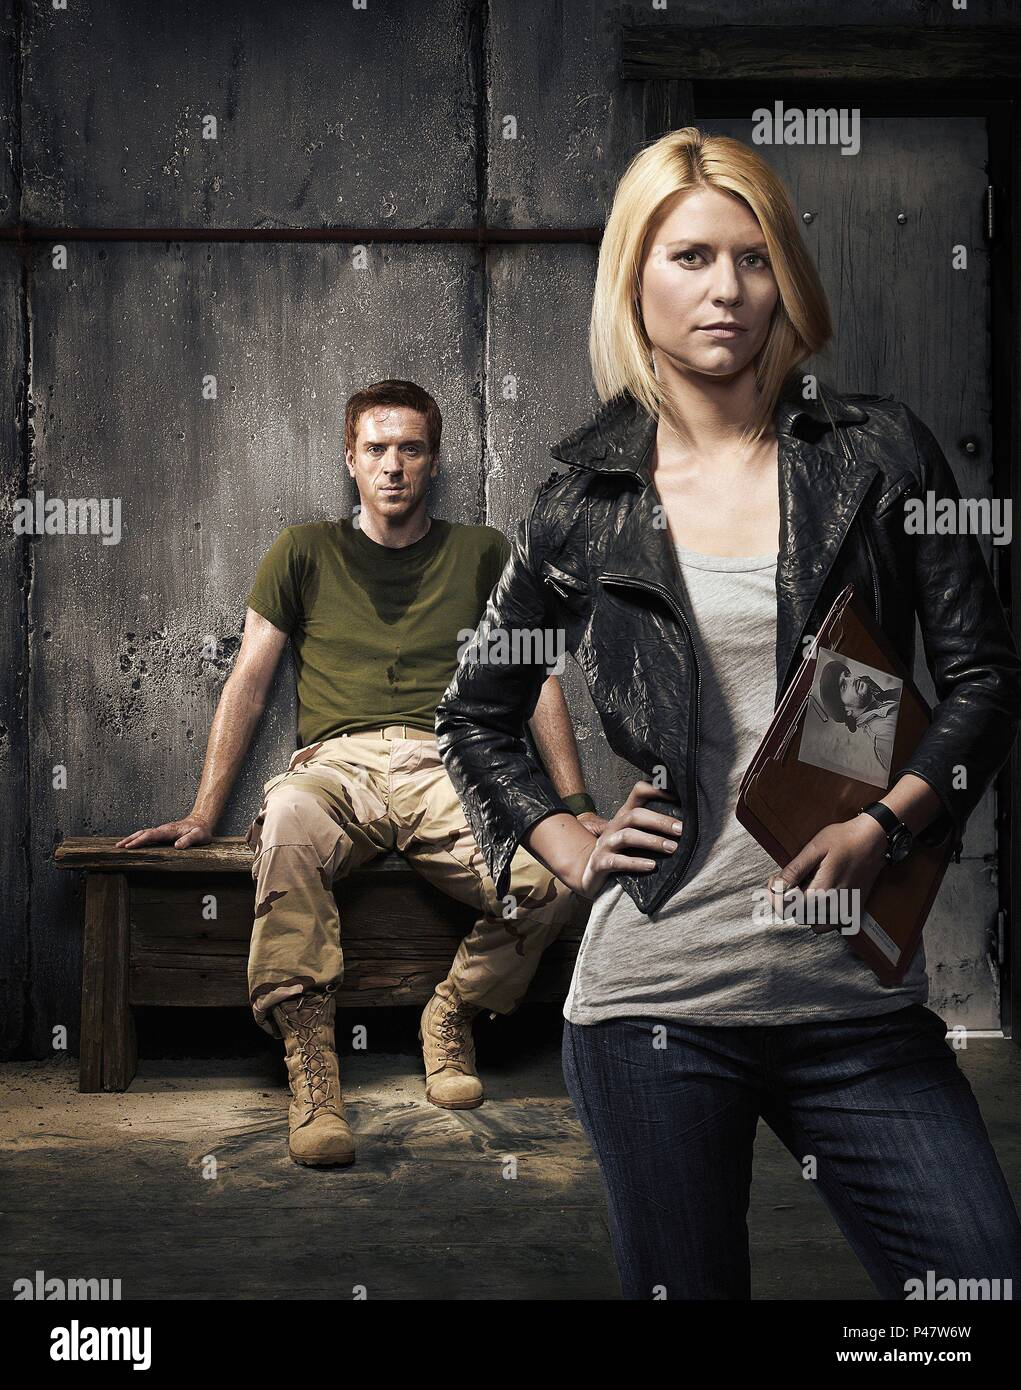 Original Film Title: HOMELAND.  English Title: HOMELAND.  Year: 2011.  Stars: CLAIRE DANES; DAMIAN LEWIS. Credit: FOX 21 / Album - Stock Image